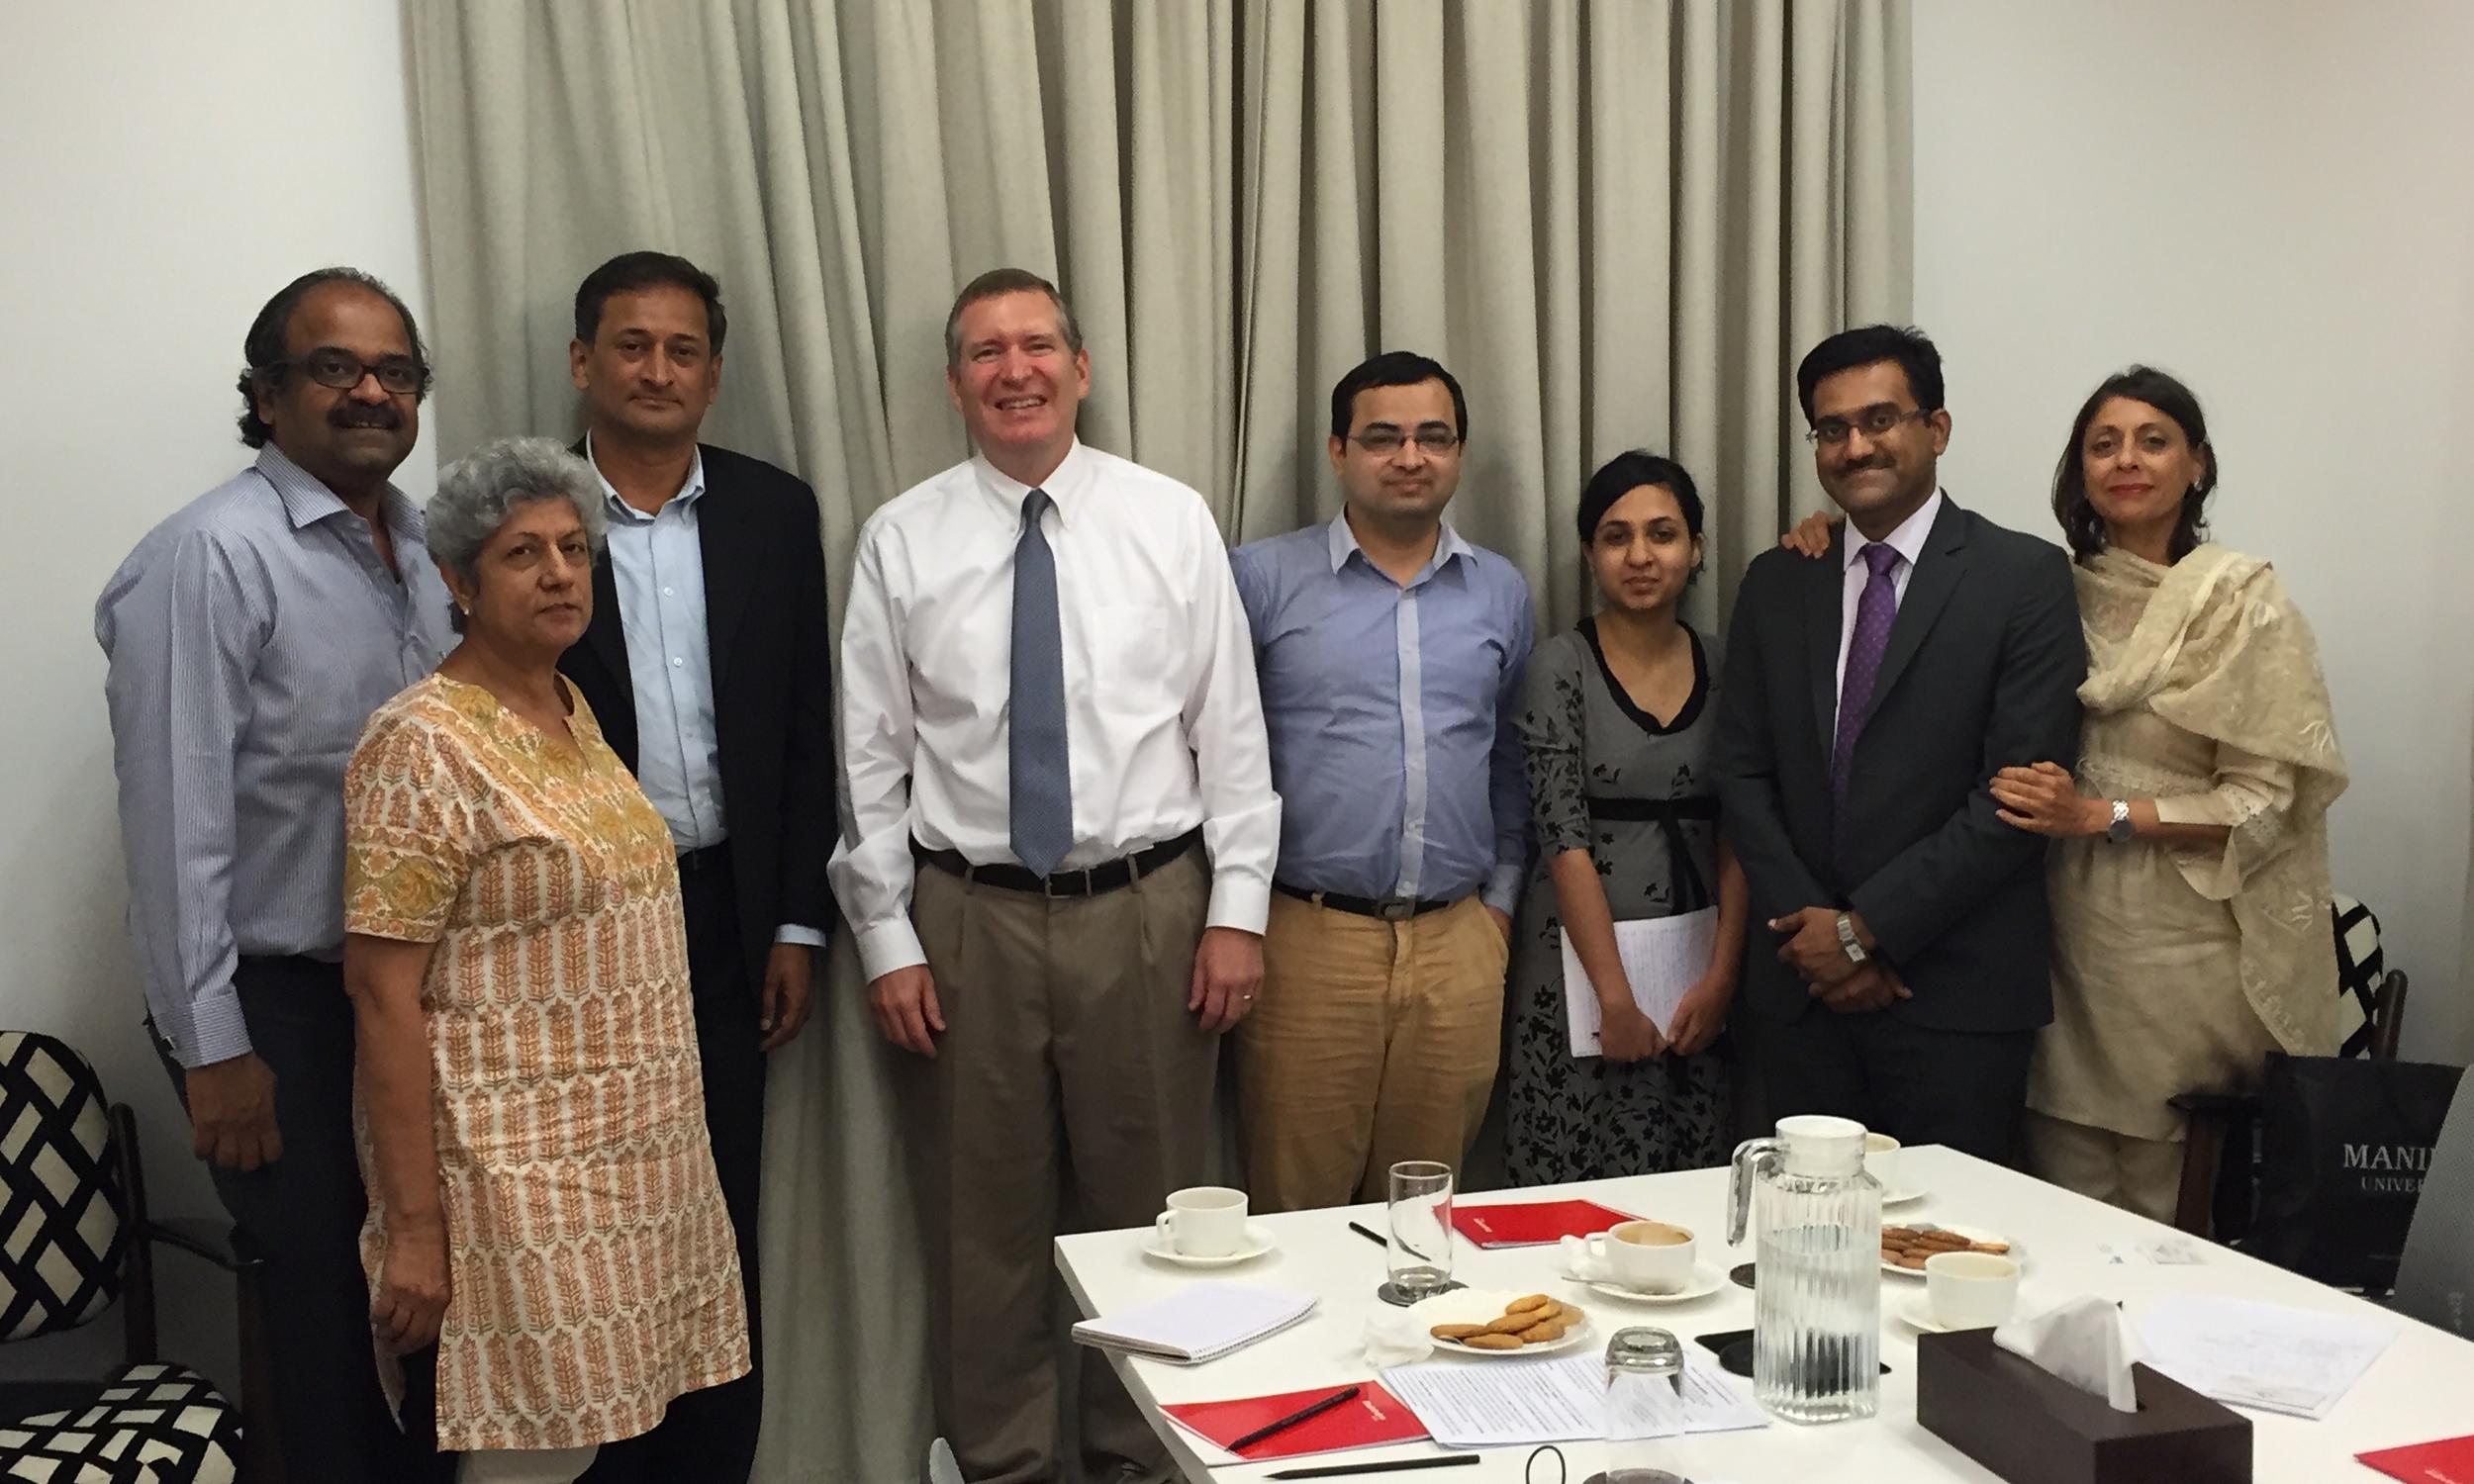 From left: Blaise Fernandes, Neelam Deo, W.S. Ravishankar, John Lunt, Amit Bhandari, Sharmadha Srinivasan, Sameer Patil, Manjeet Kripalani